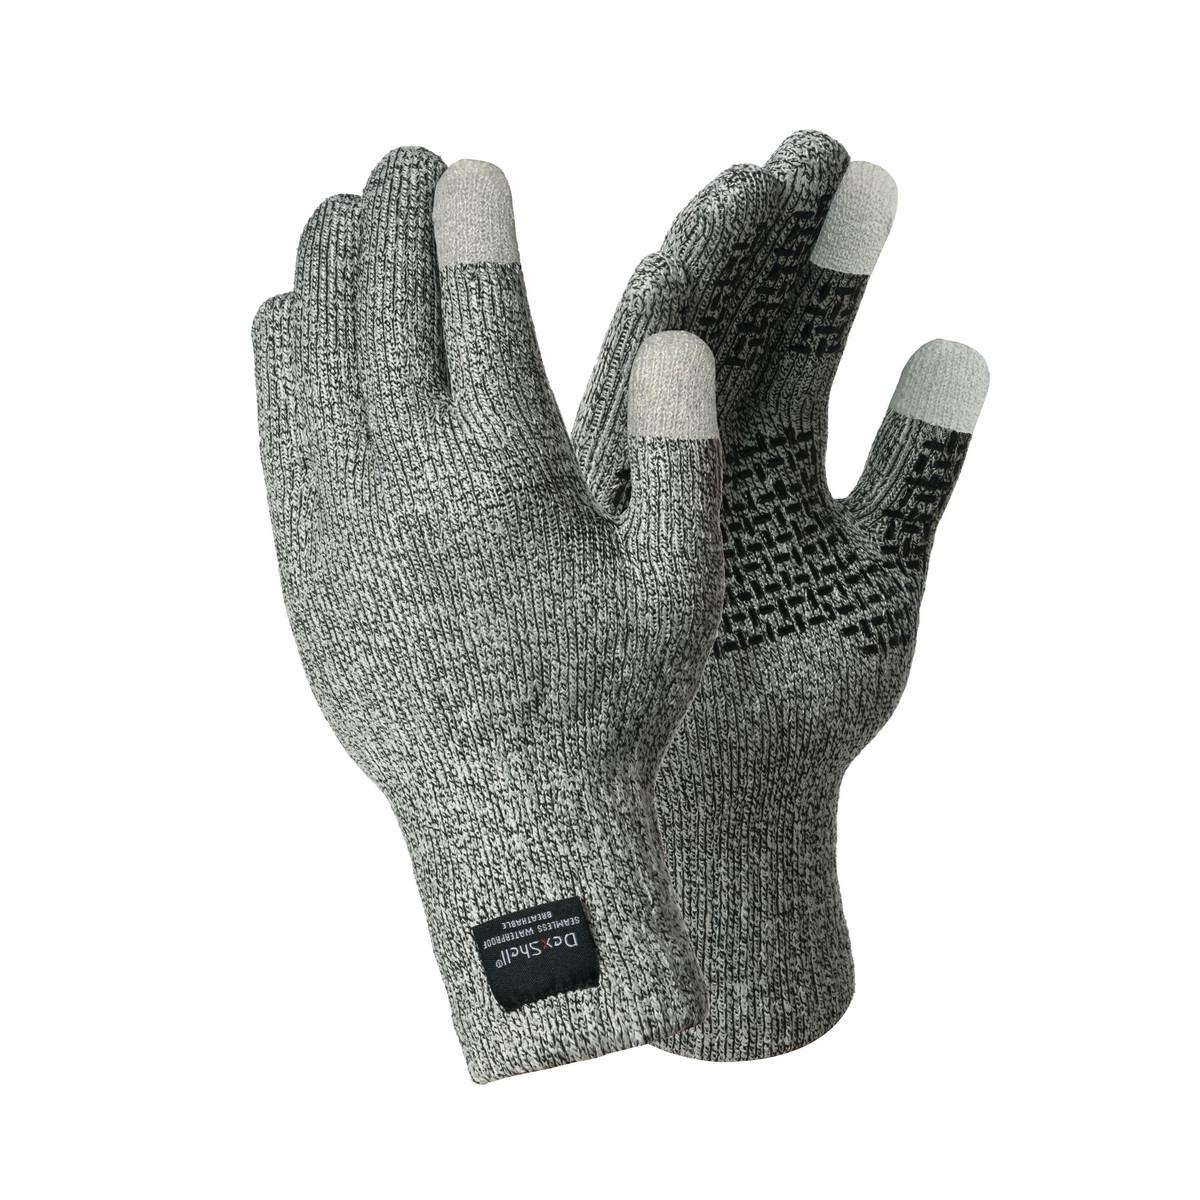 Dexshell Techshield XL Перчатки водонепроницаемые  с белыми пальцами